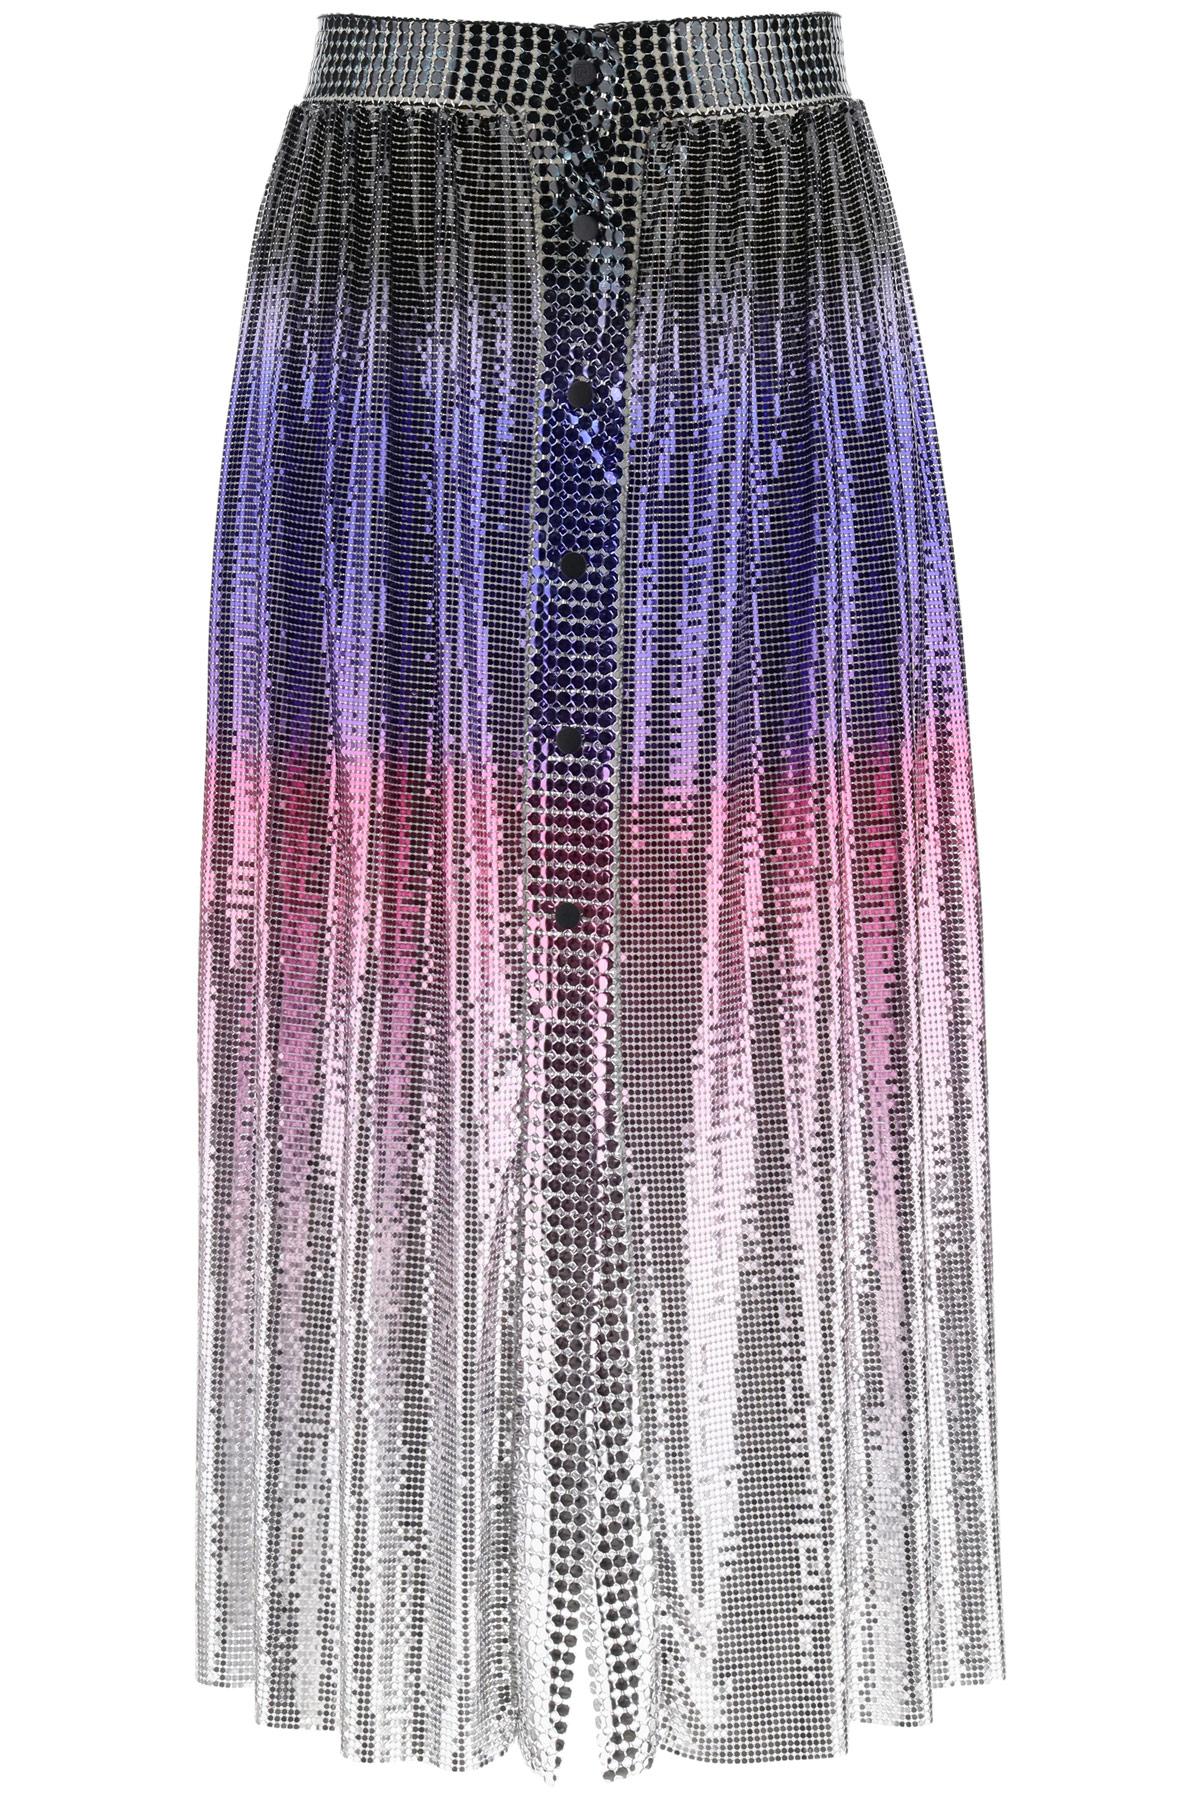 PACO RABANNE MINI MESH SHADED SKIRT 36 Silver, Pink, Blue